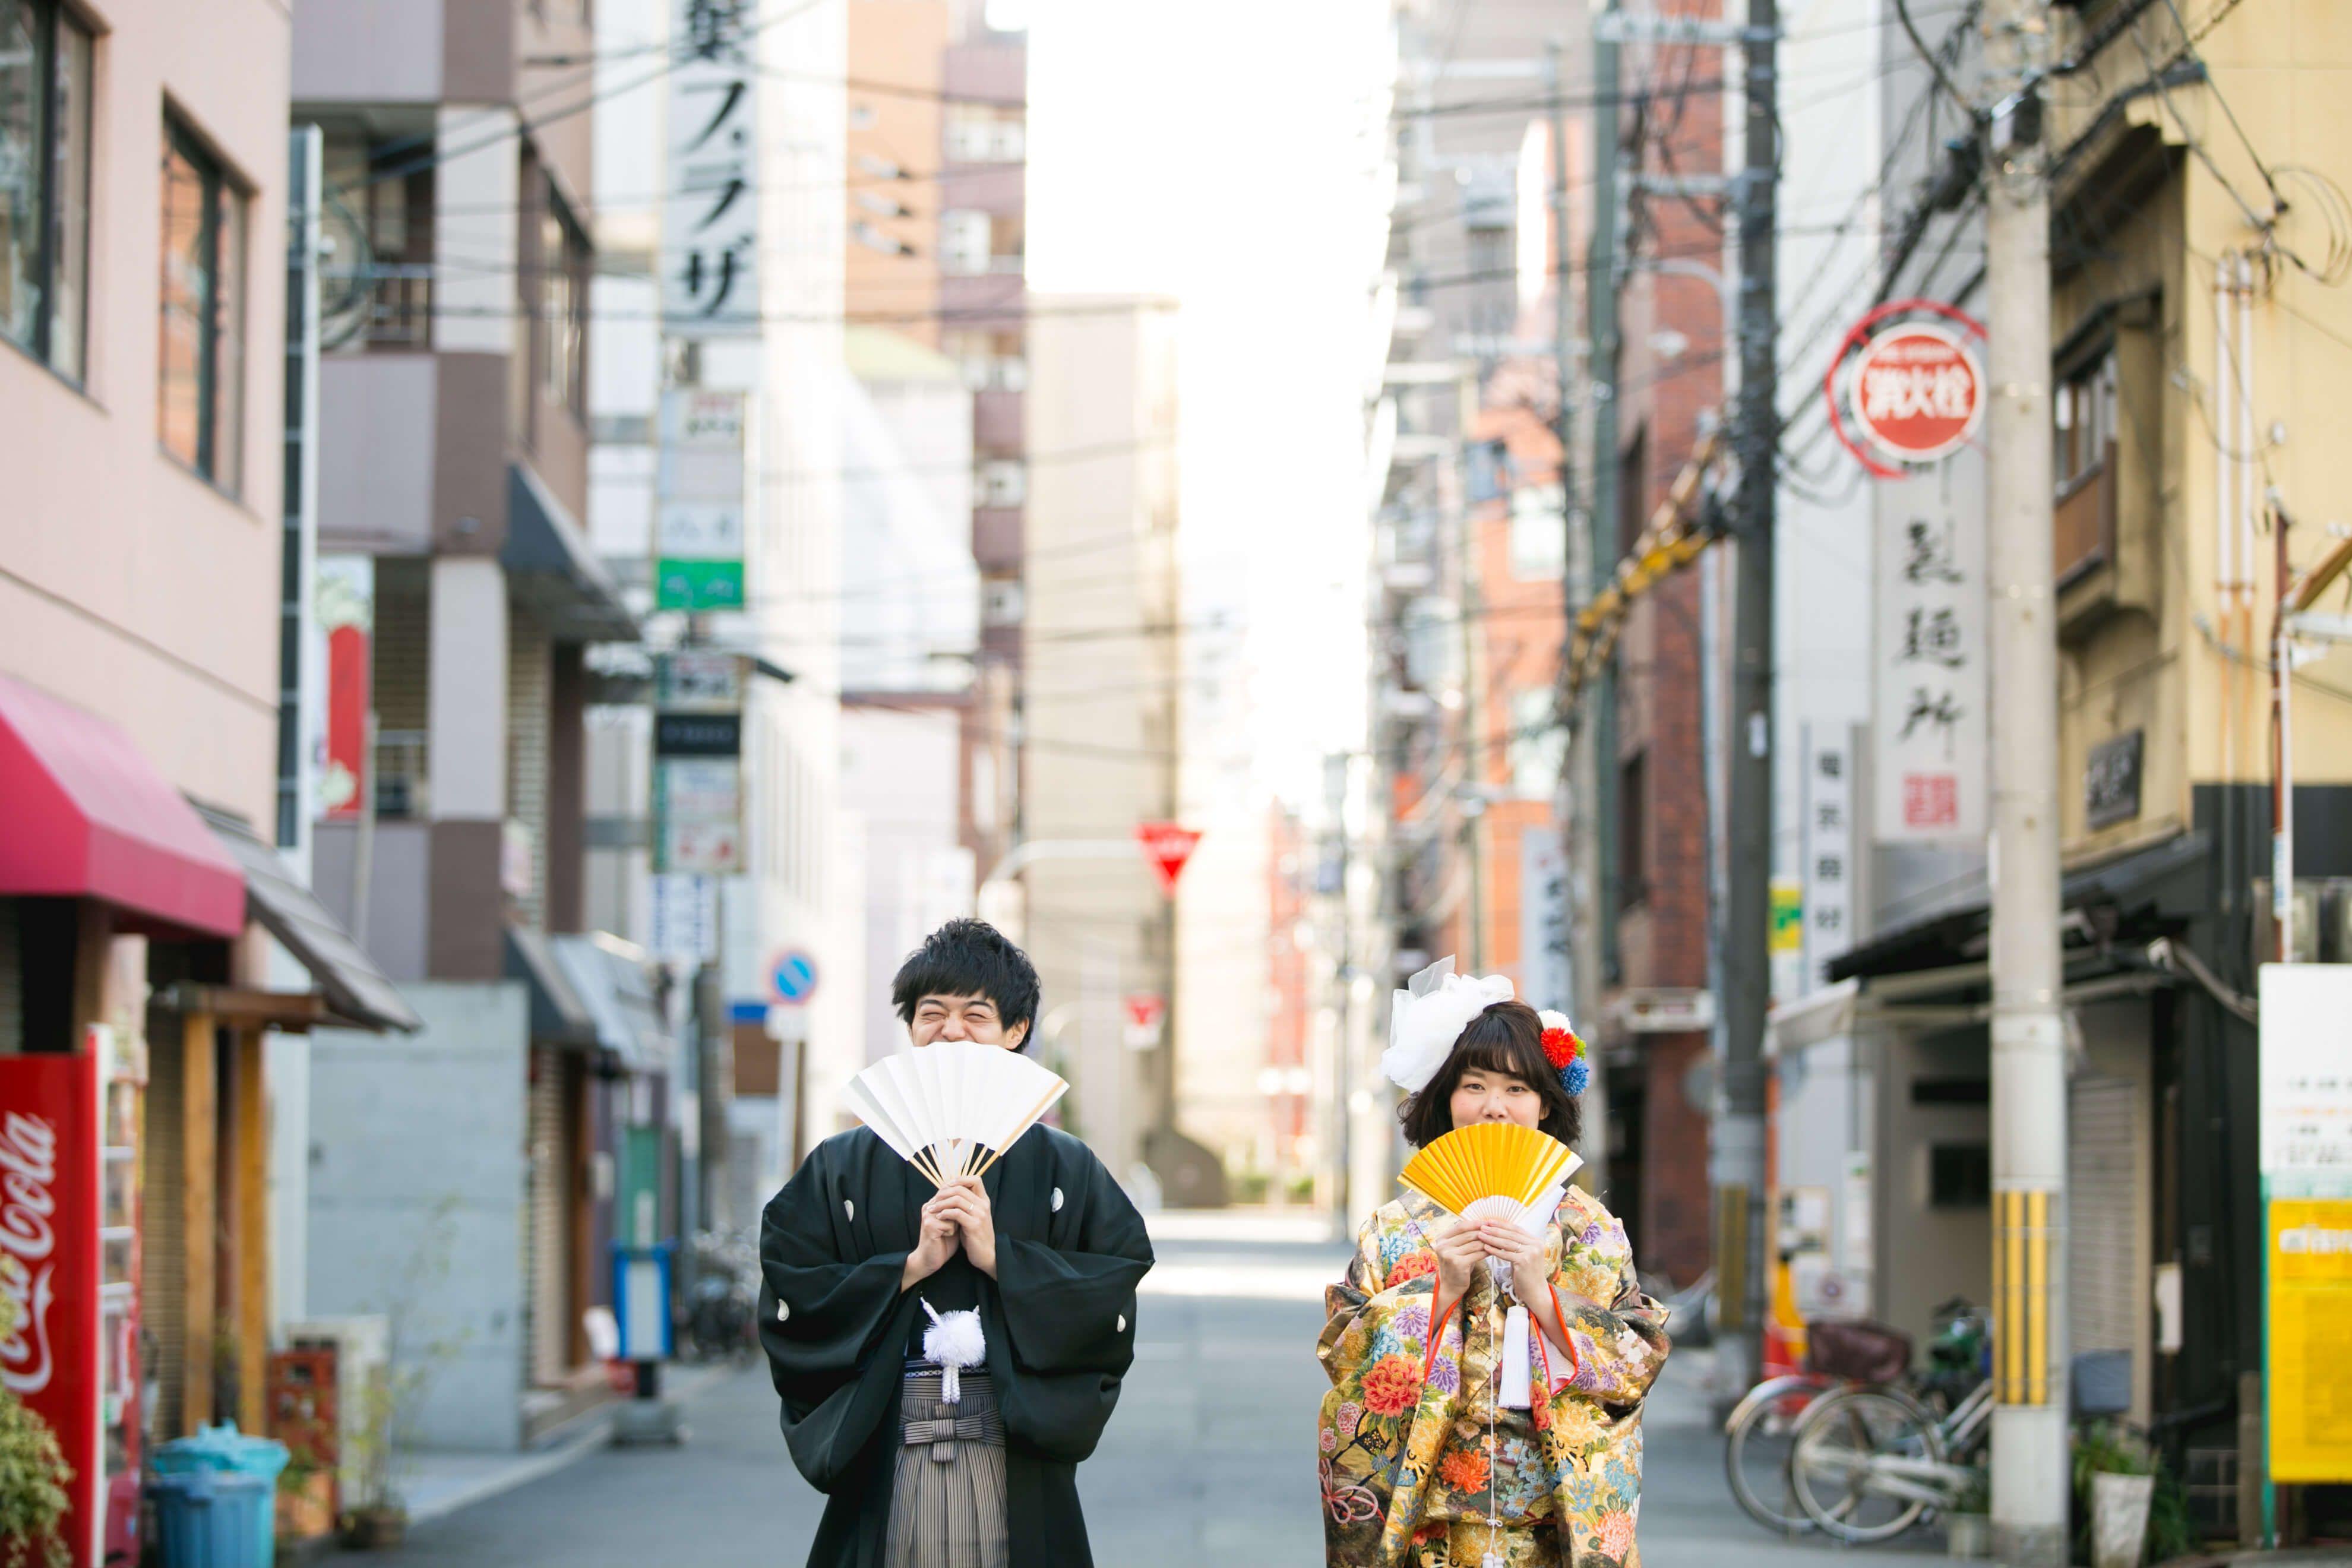 GALLERY | 大阪で結婚写真・フォトウエディング・アニバーサリーフォト・各種ロケ撮影対応のフォトスタジオ Studio LDK